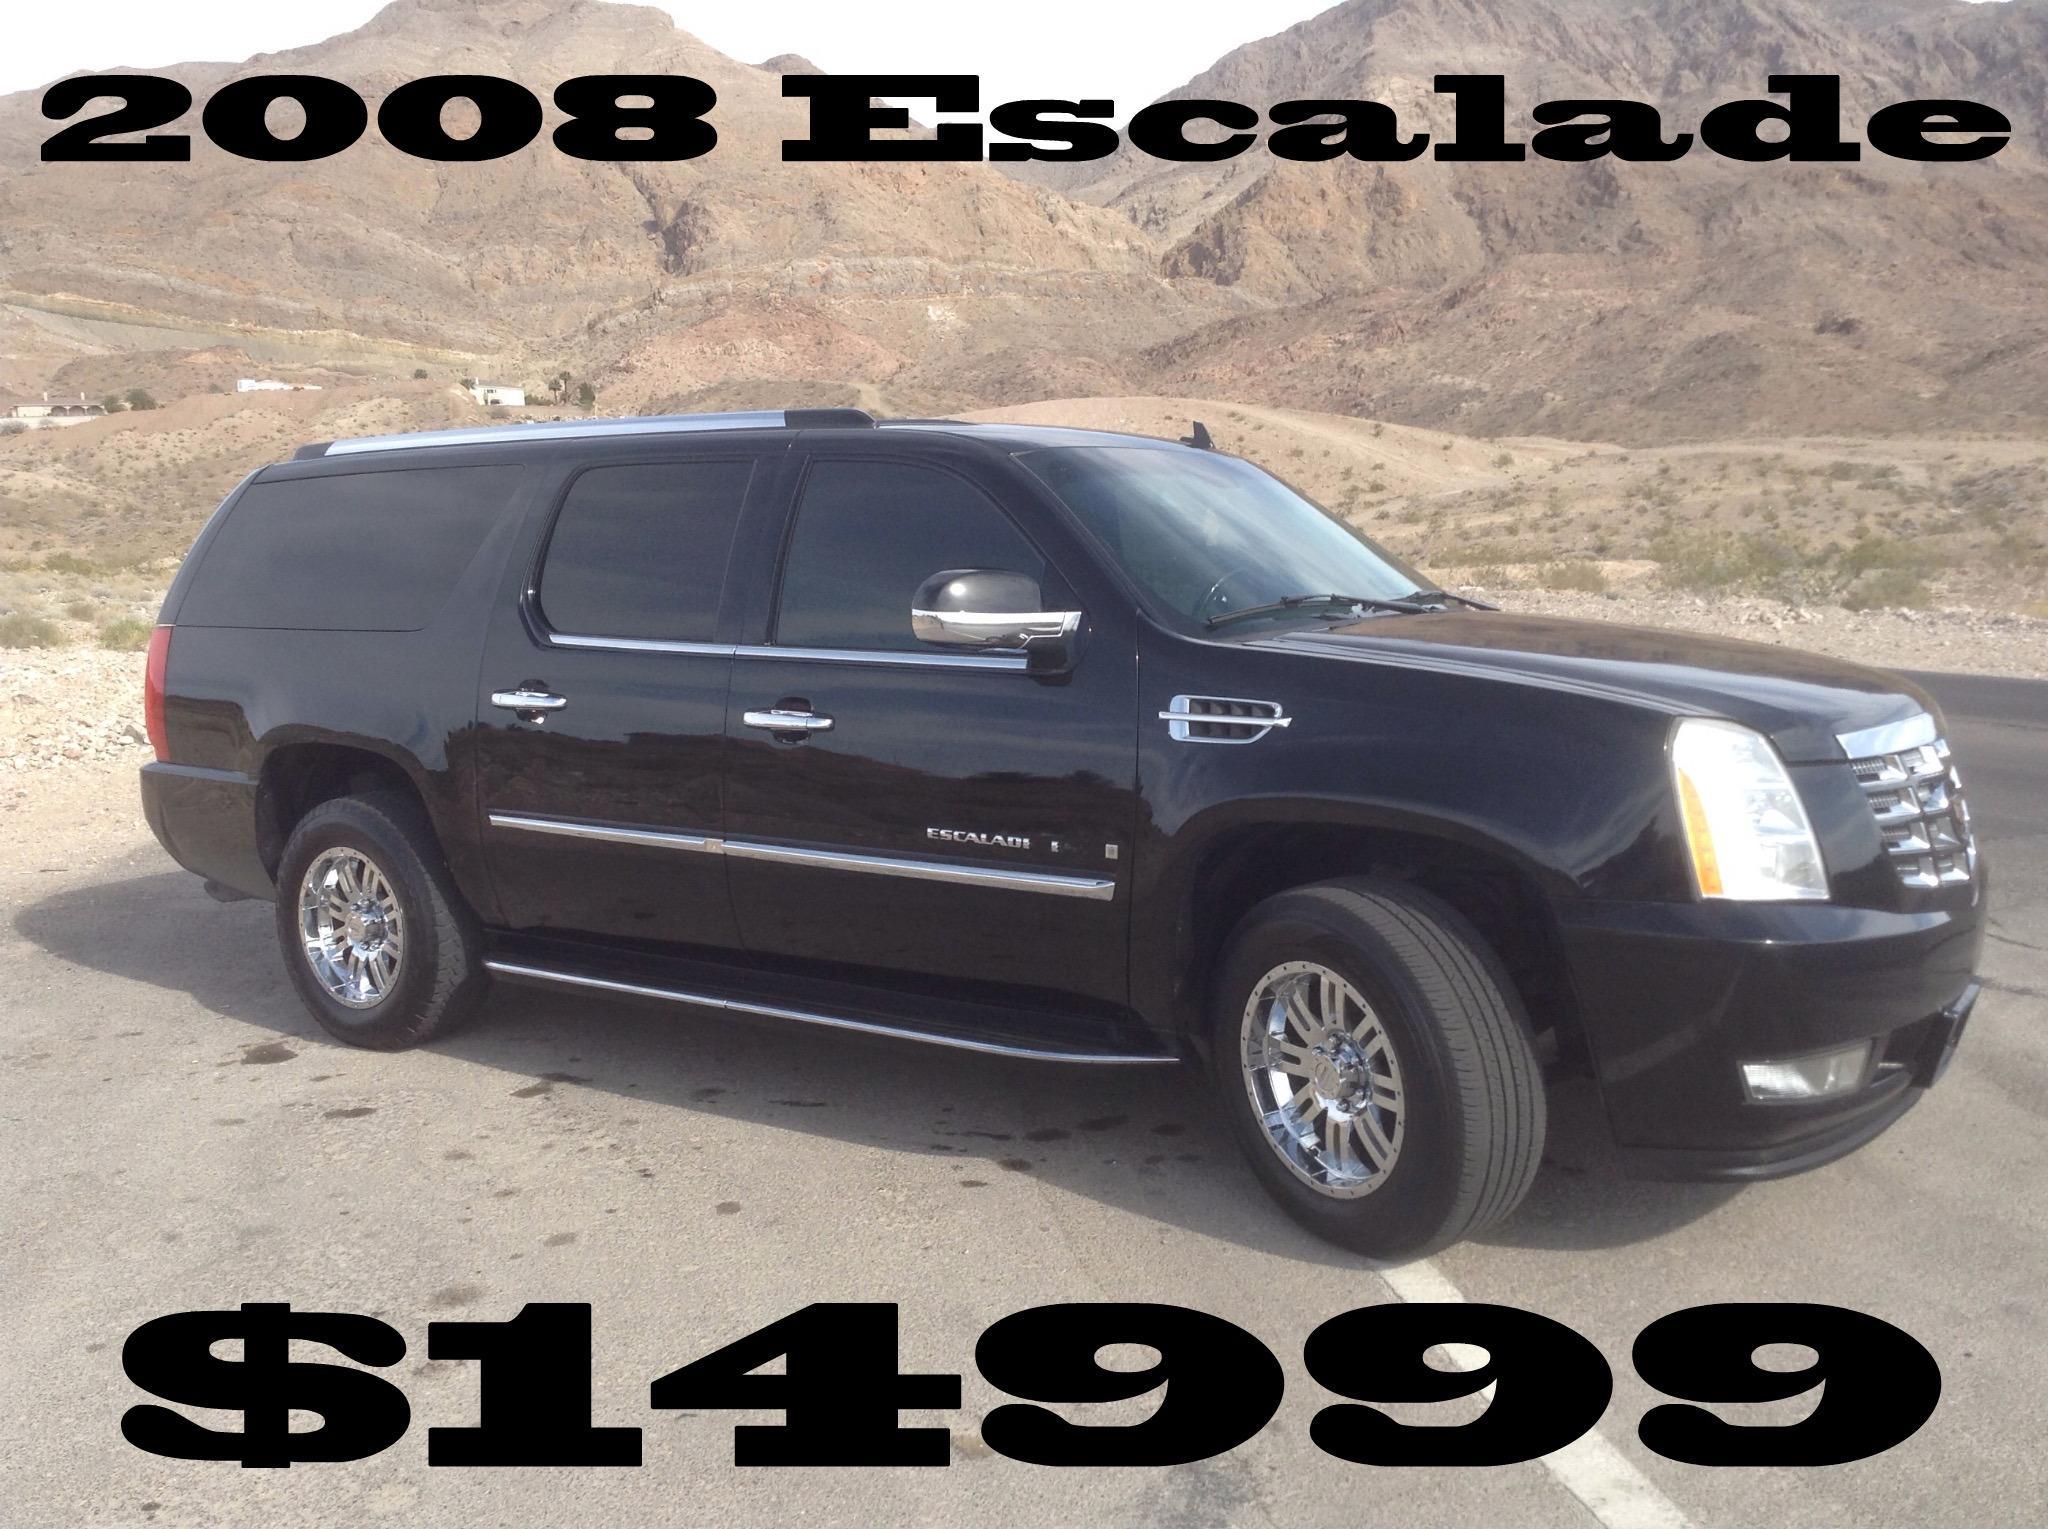 Budget Car Sales Las Vegas Nv